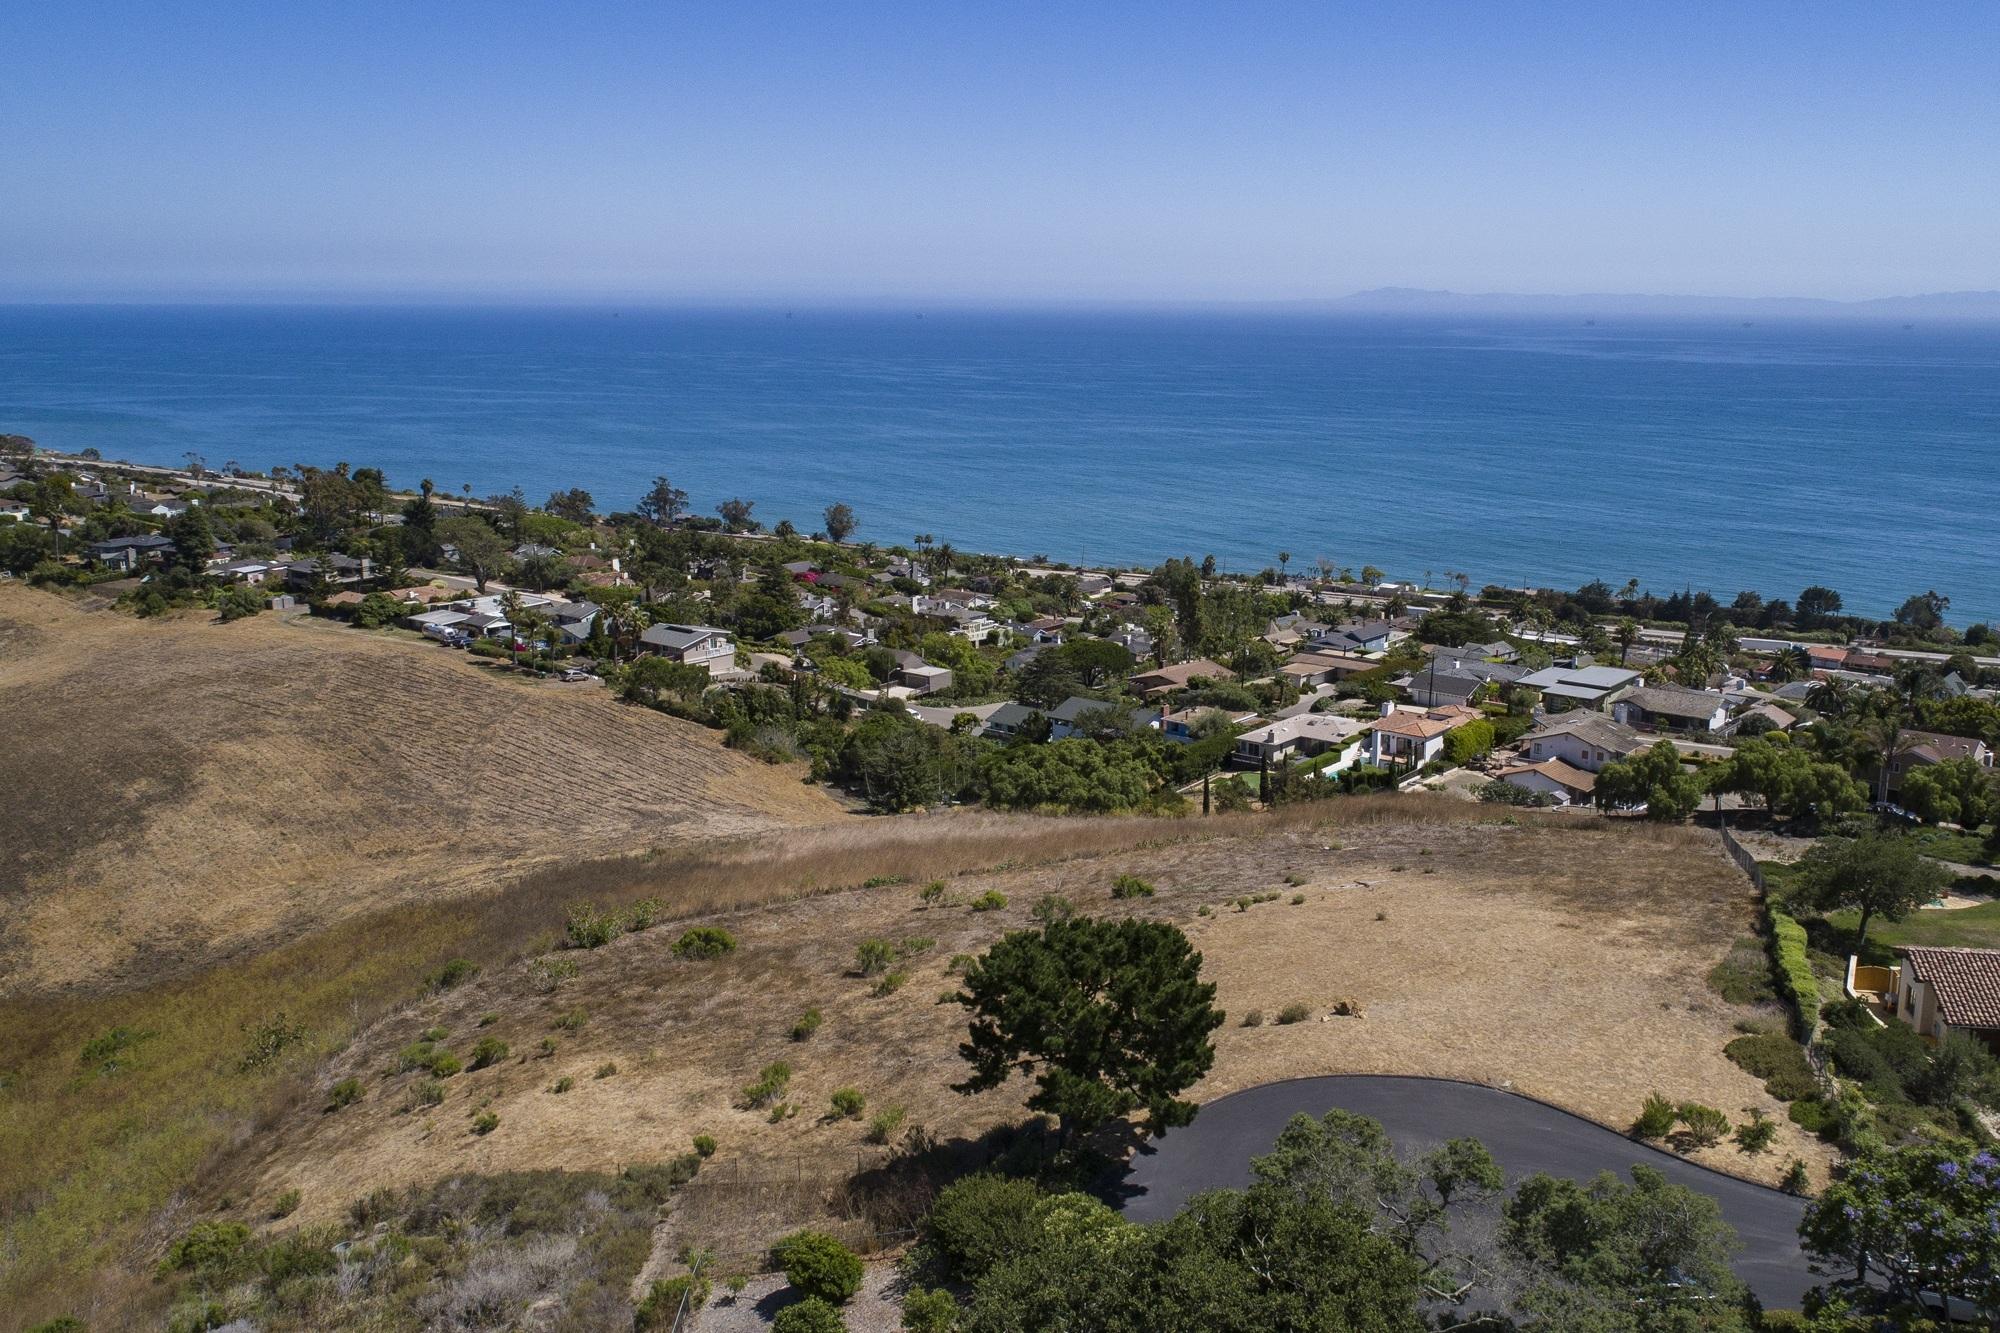 2325 Ortega Ranch - Sold Price - $2,500,000Represented Seller